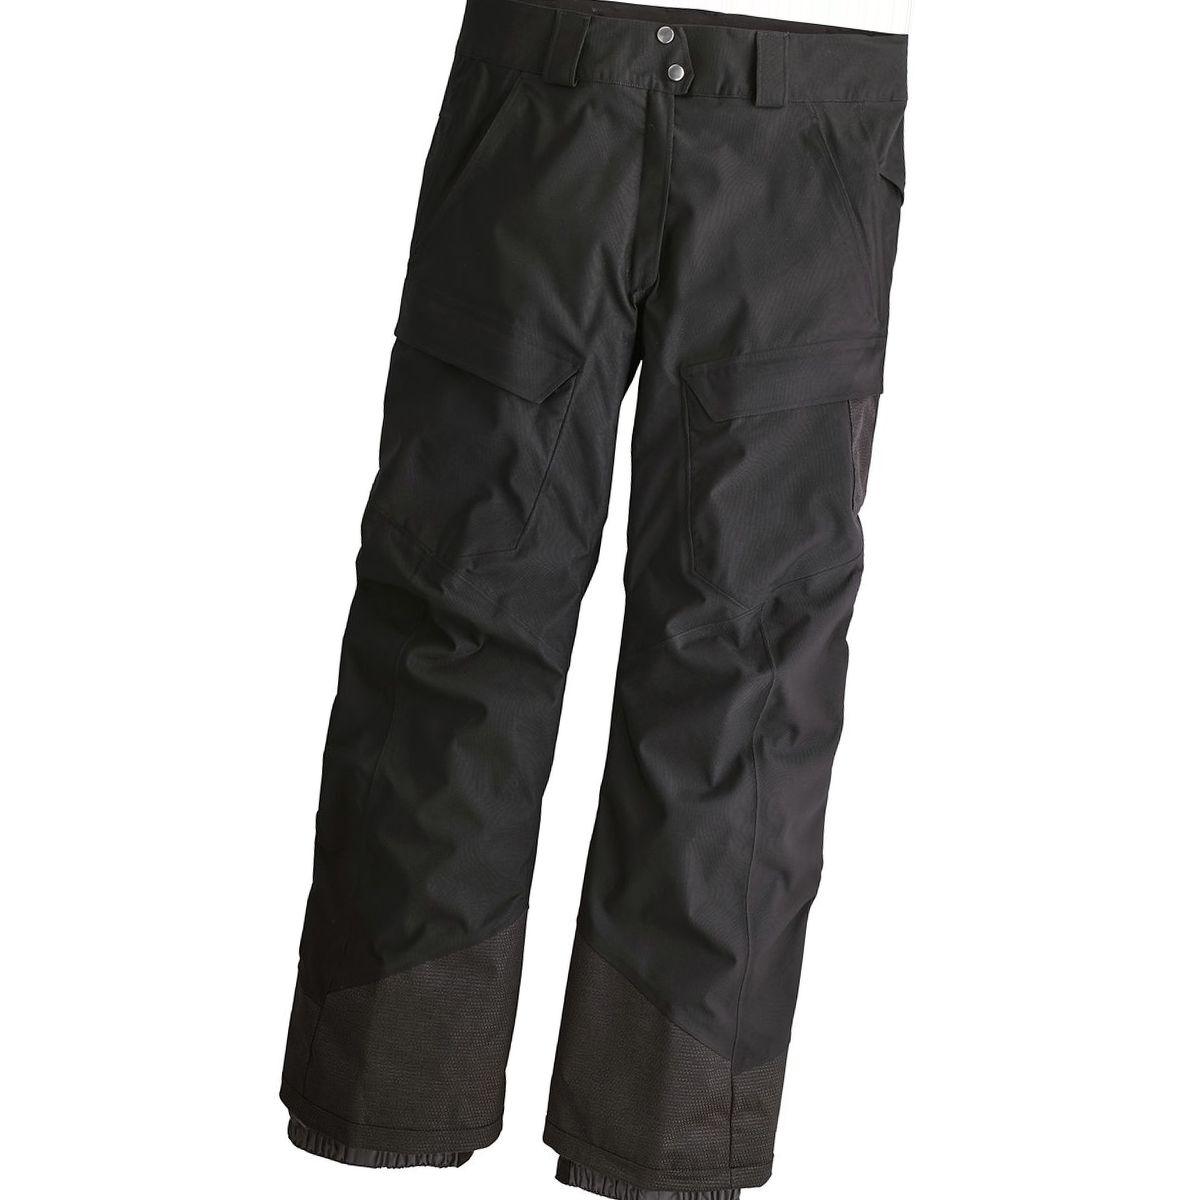 Patagonia Mountain Utility Pant - Men's